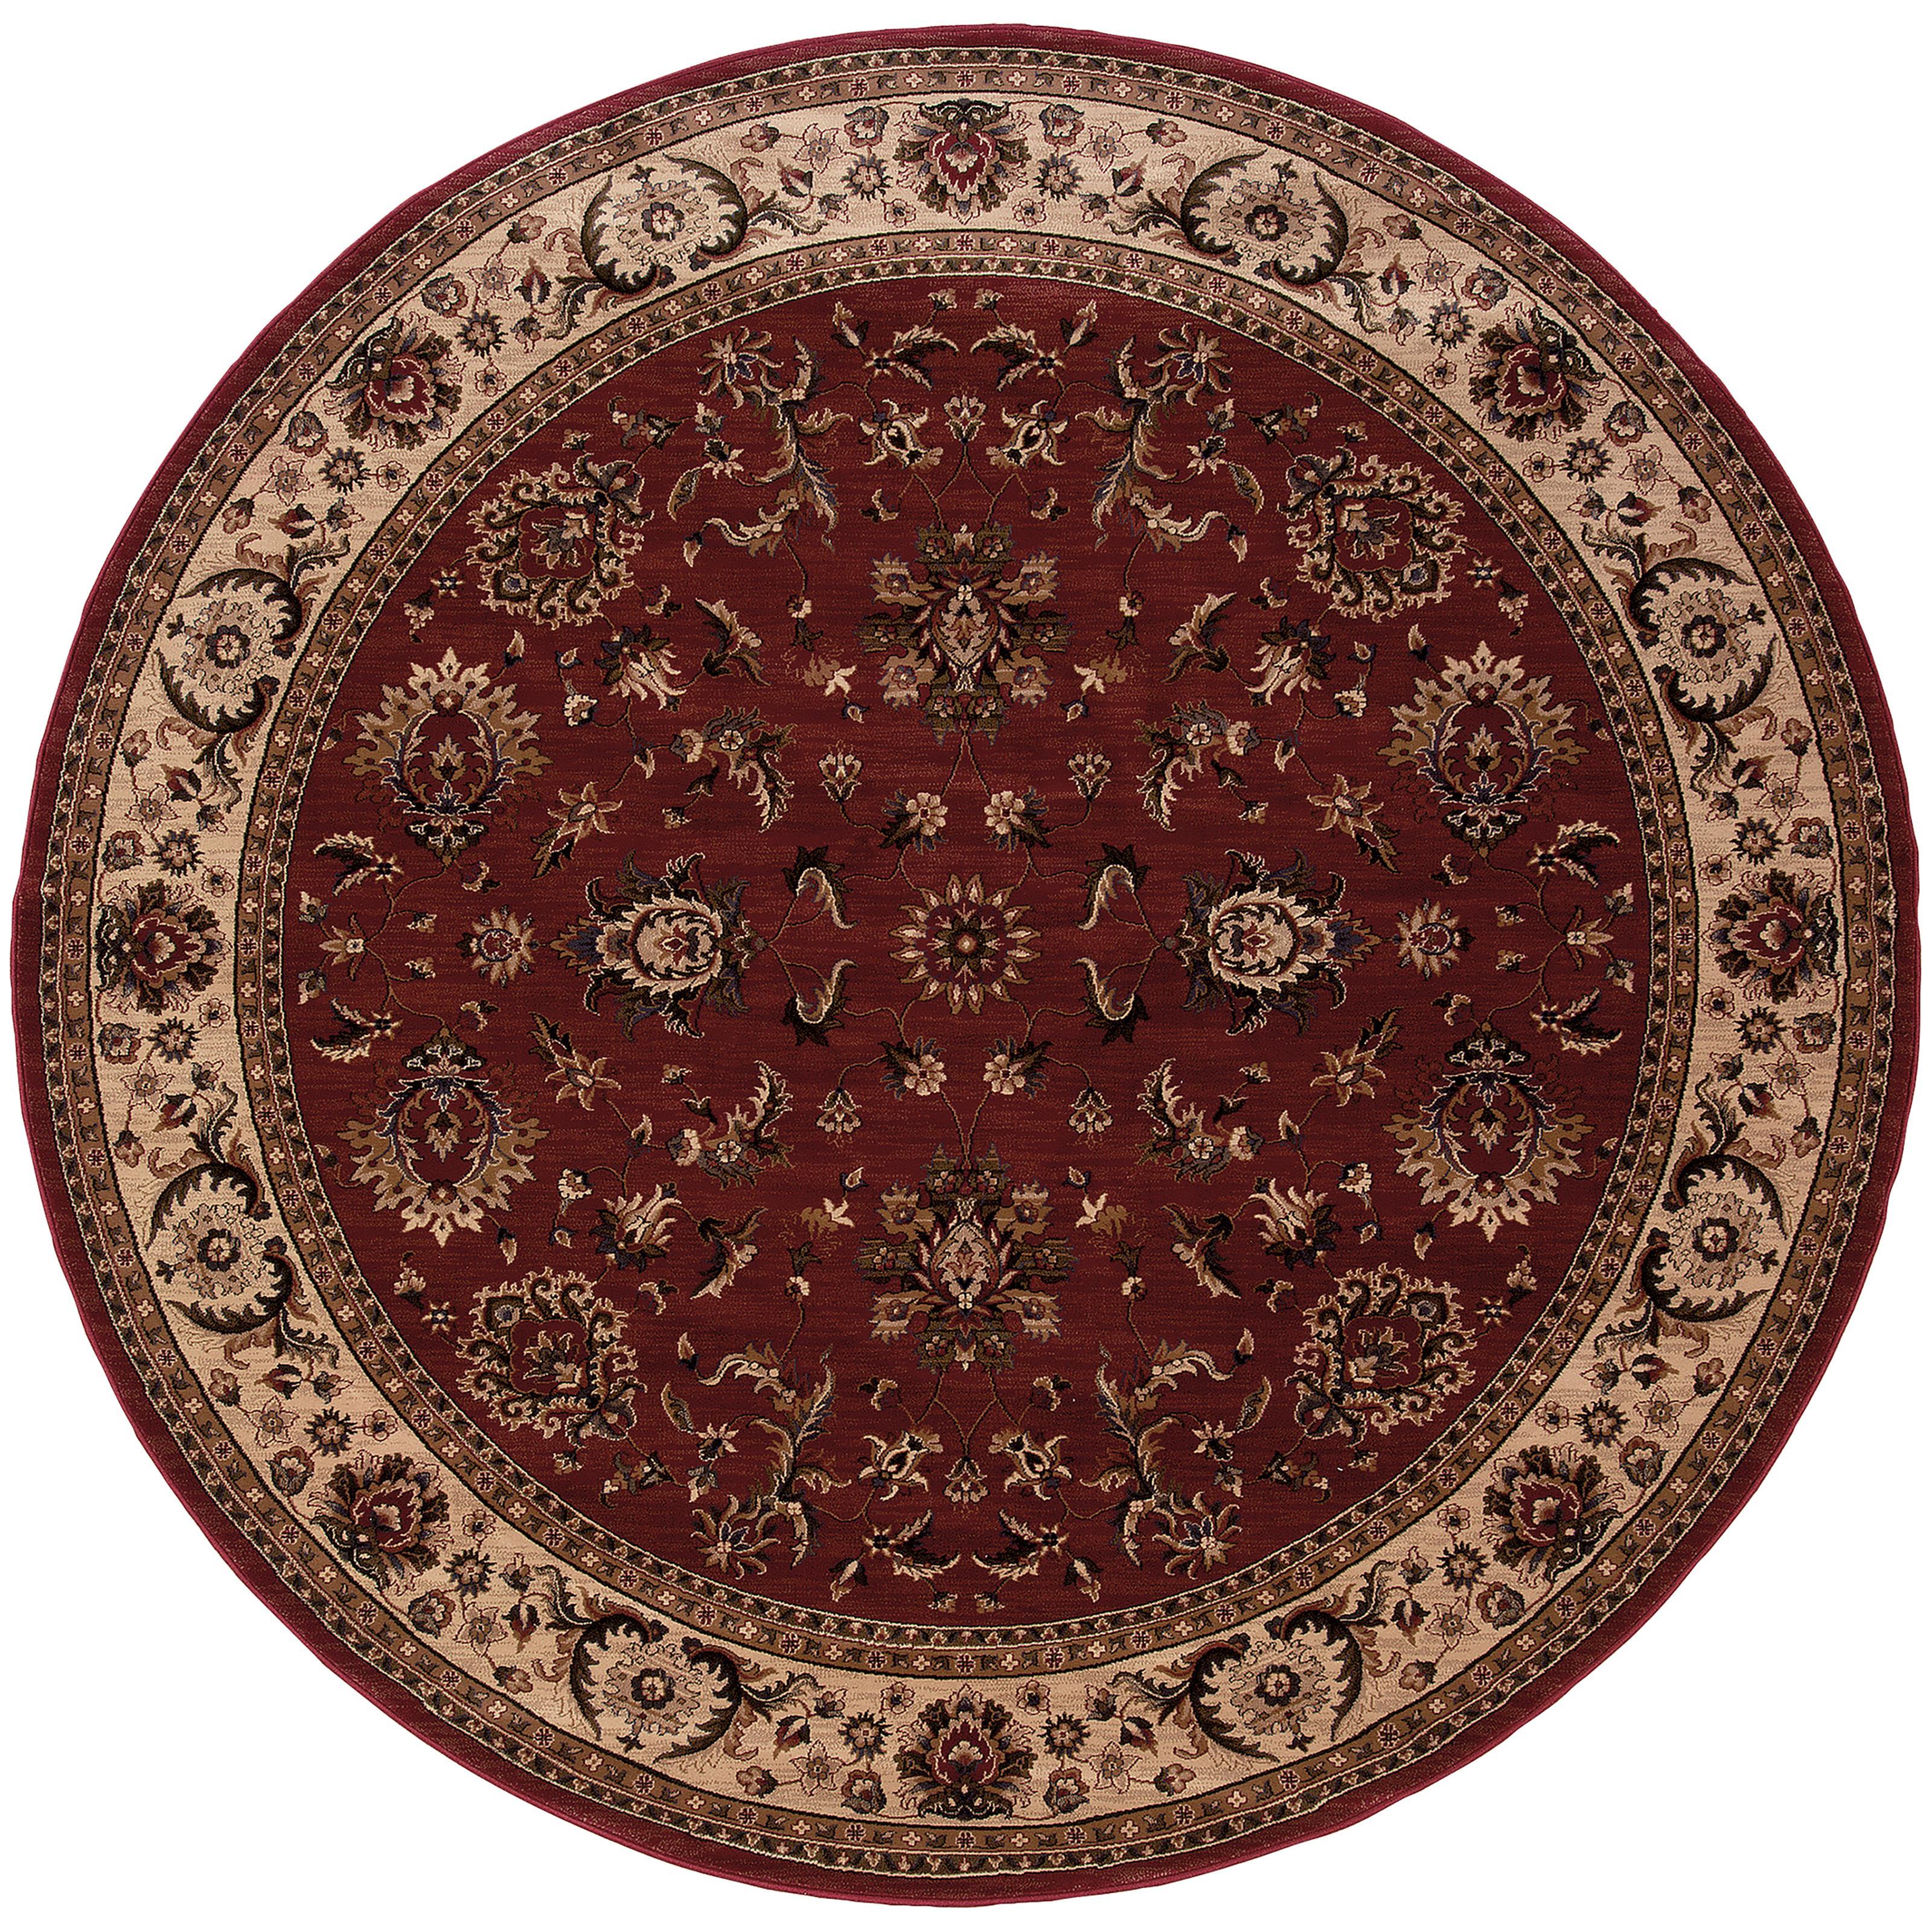 Ariana 6' Rug by Oriental Weavers at Novello Home Furnishings